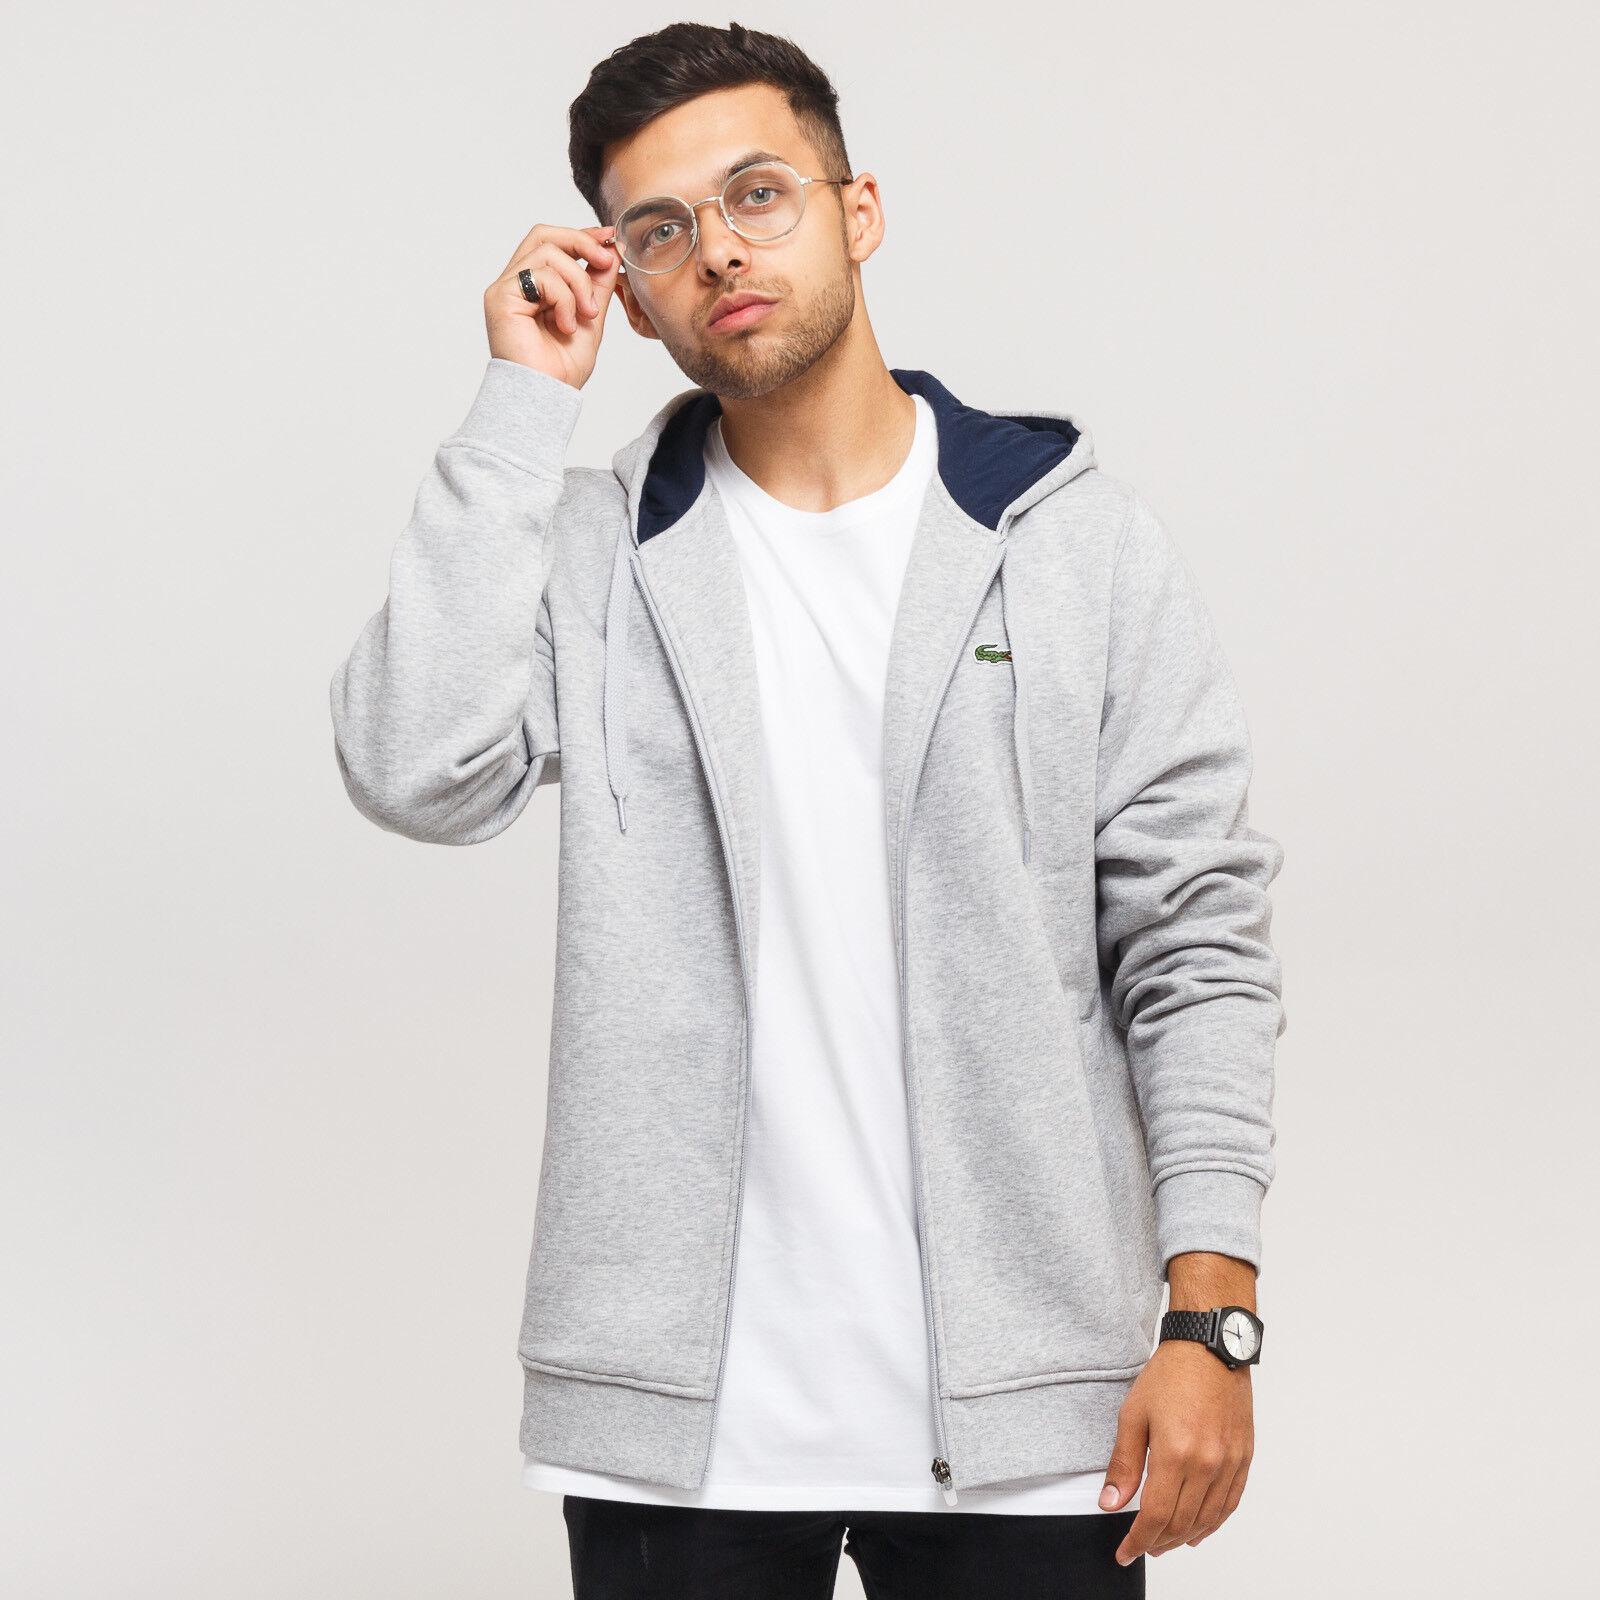 LACOSTE Sweatshirt & Hoodie grau melange melange melange S, Grau, SH7609  | Schön In Der Farbe  e8e0da